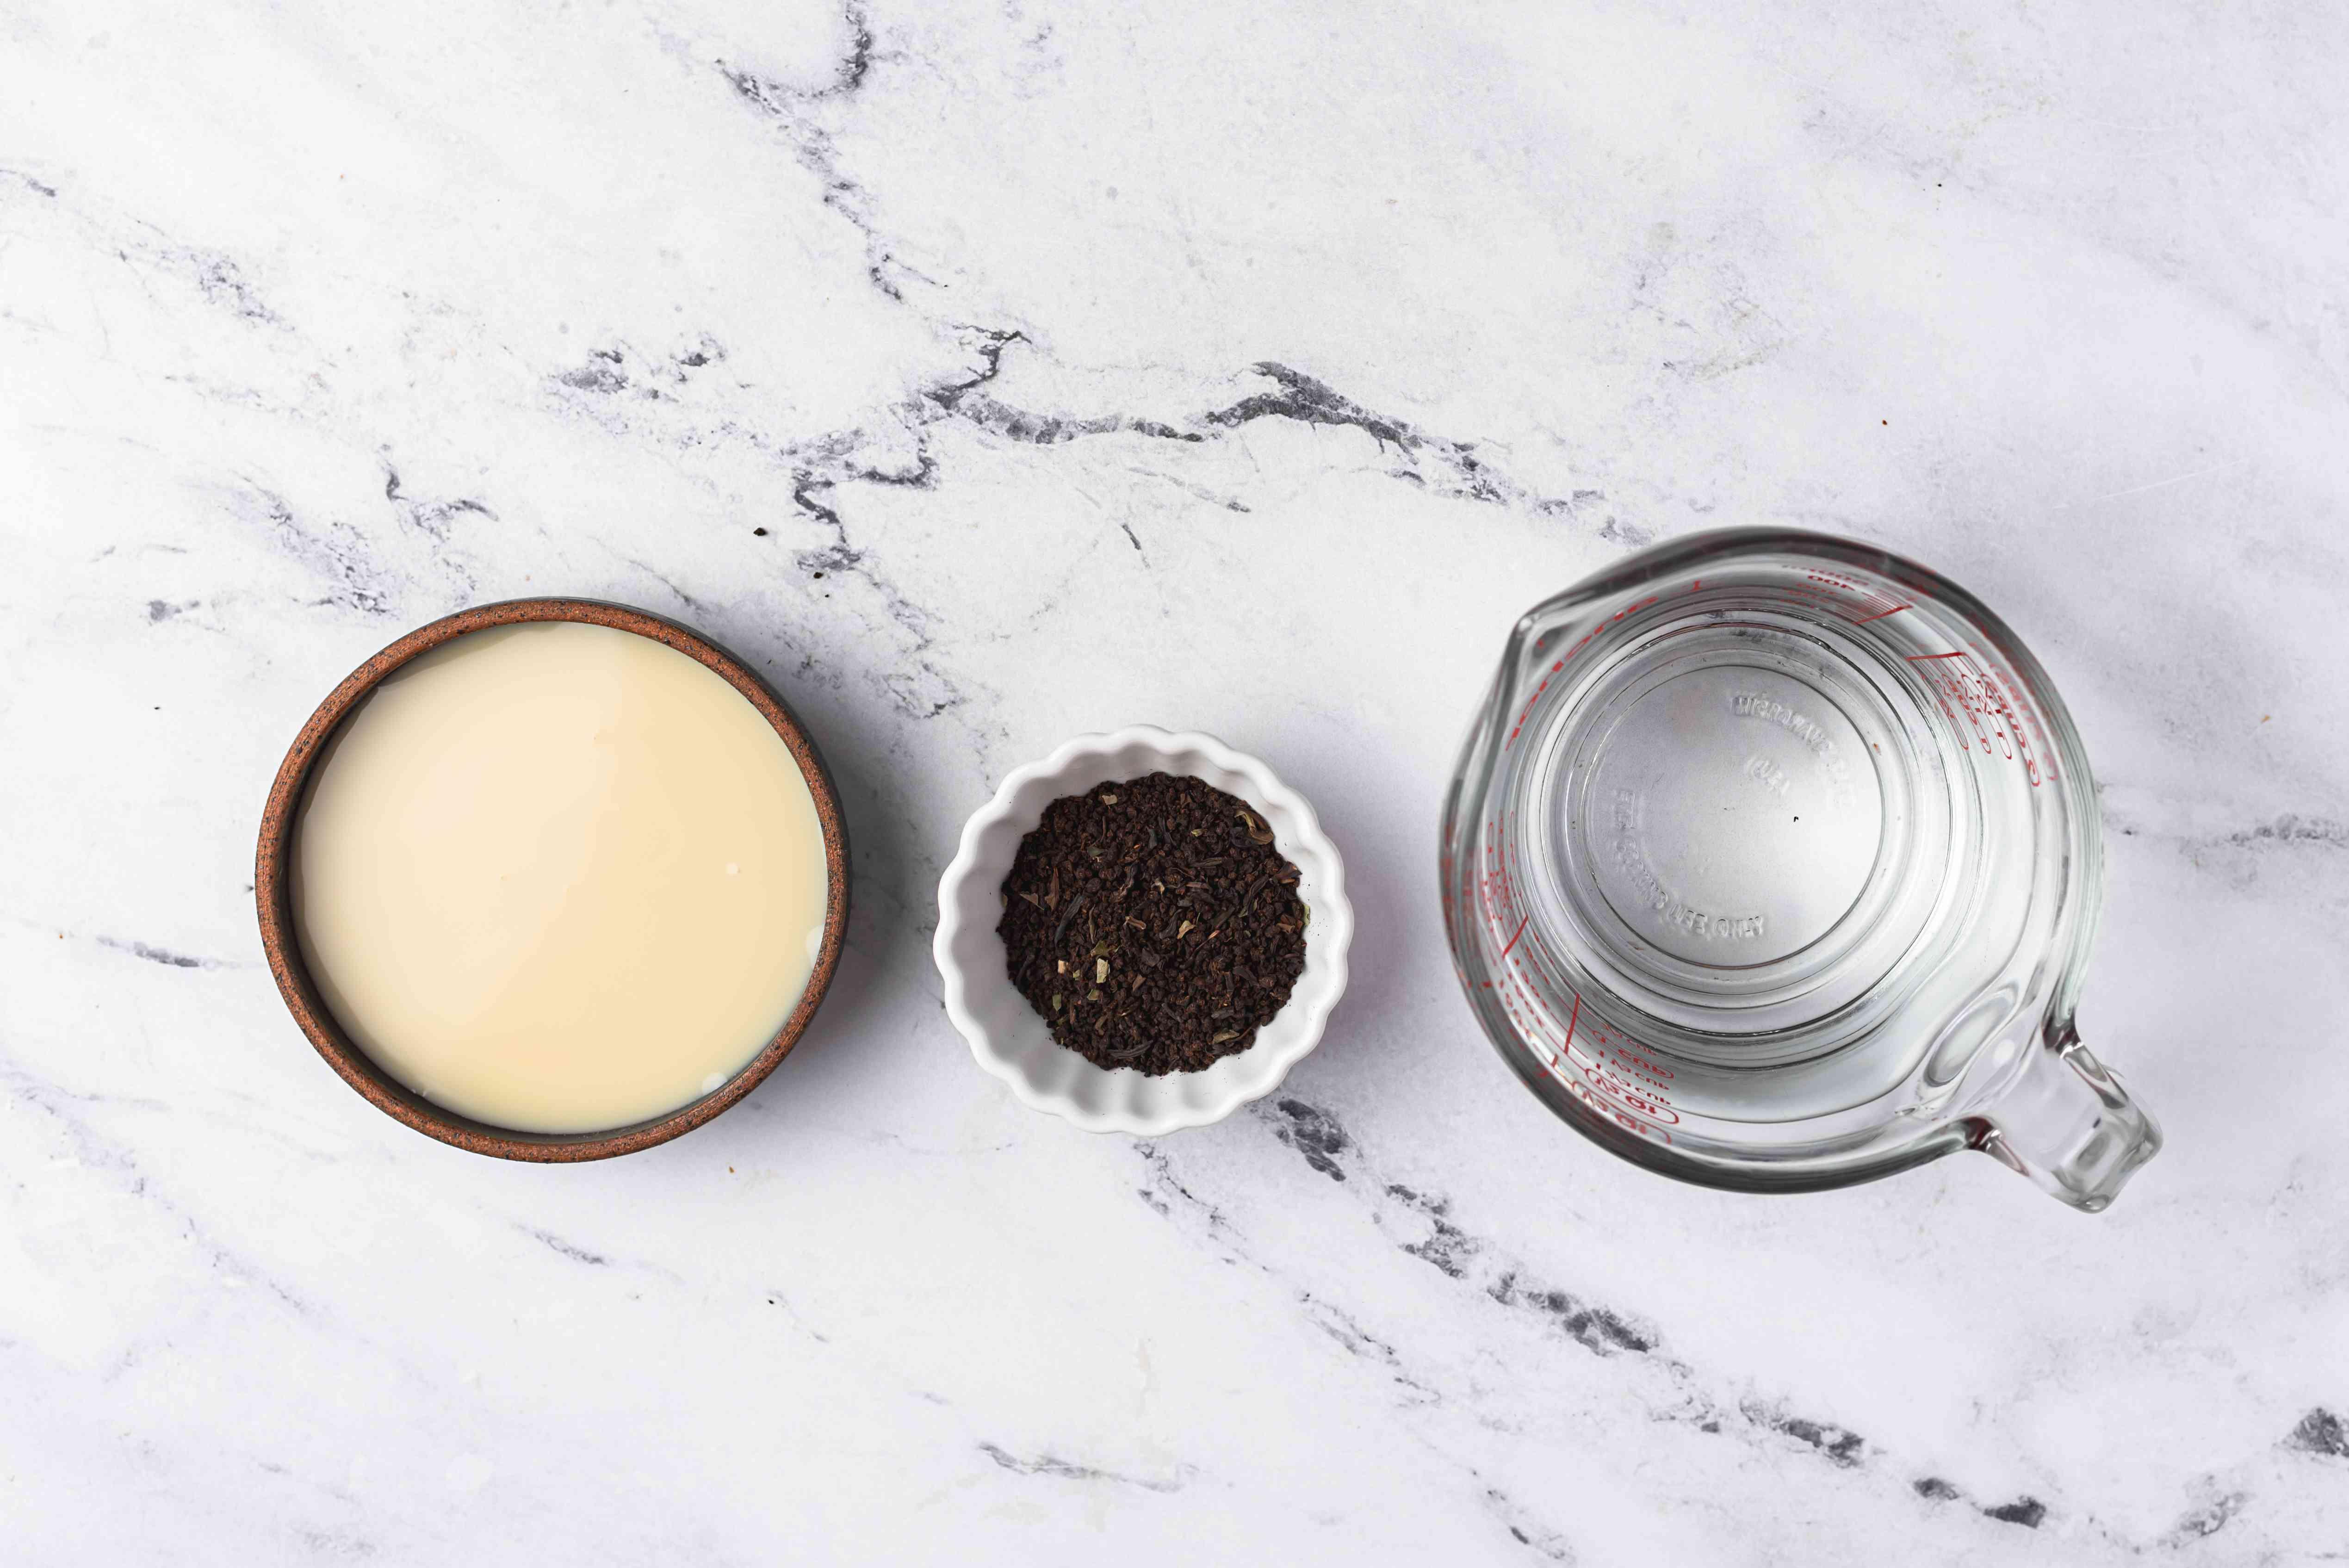 Ingredients for Hong Kong milk tea